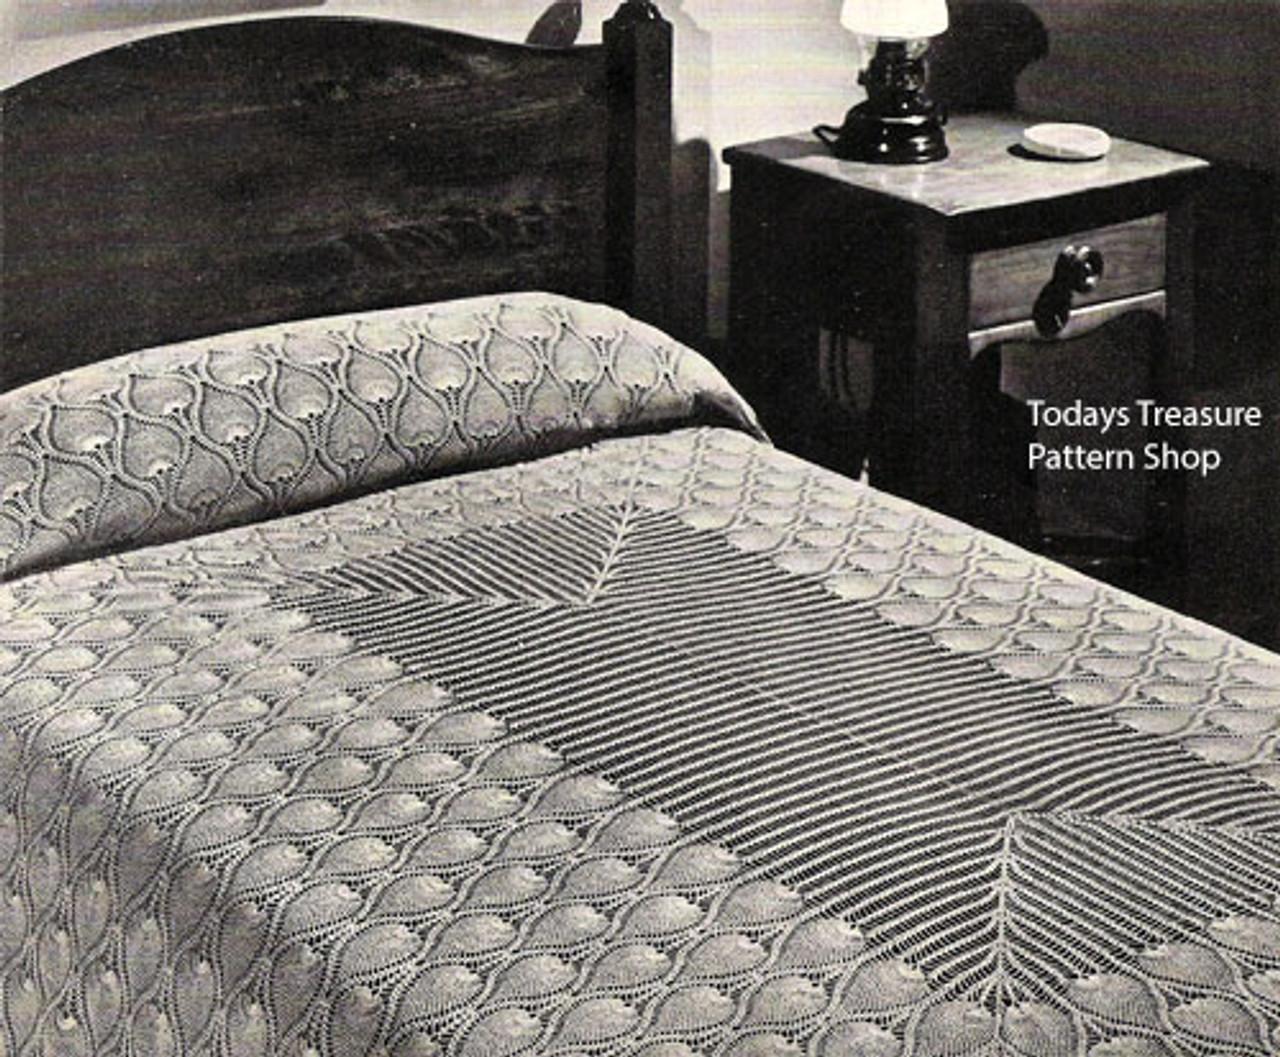 Vintage Pineapple Crocheted Bedspread Pattern